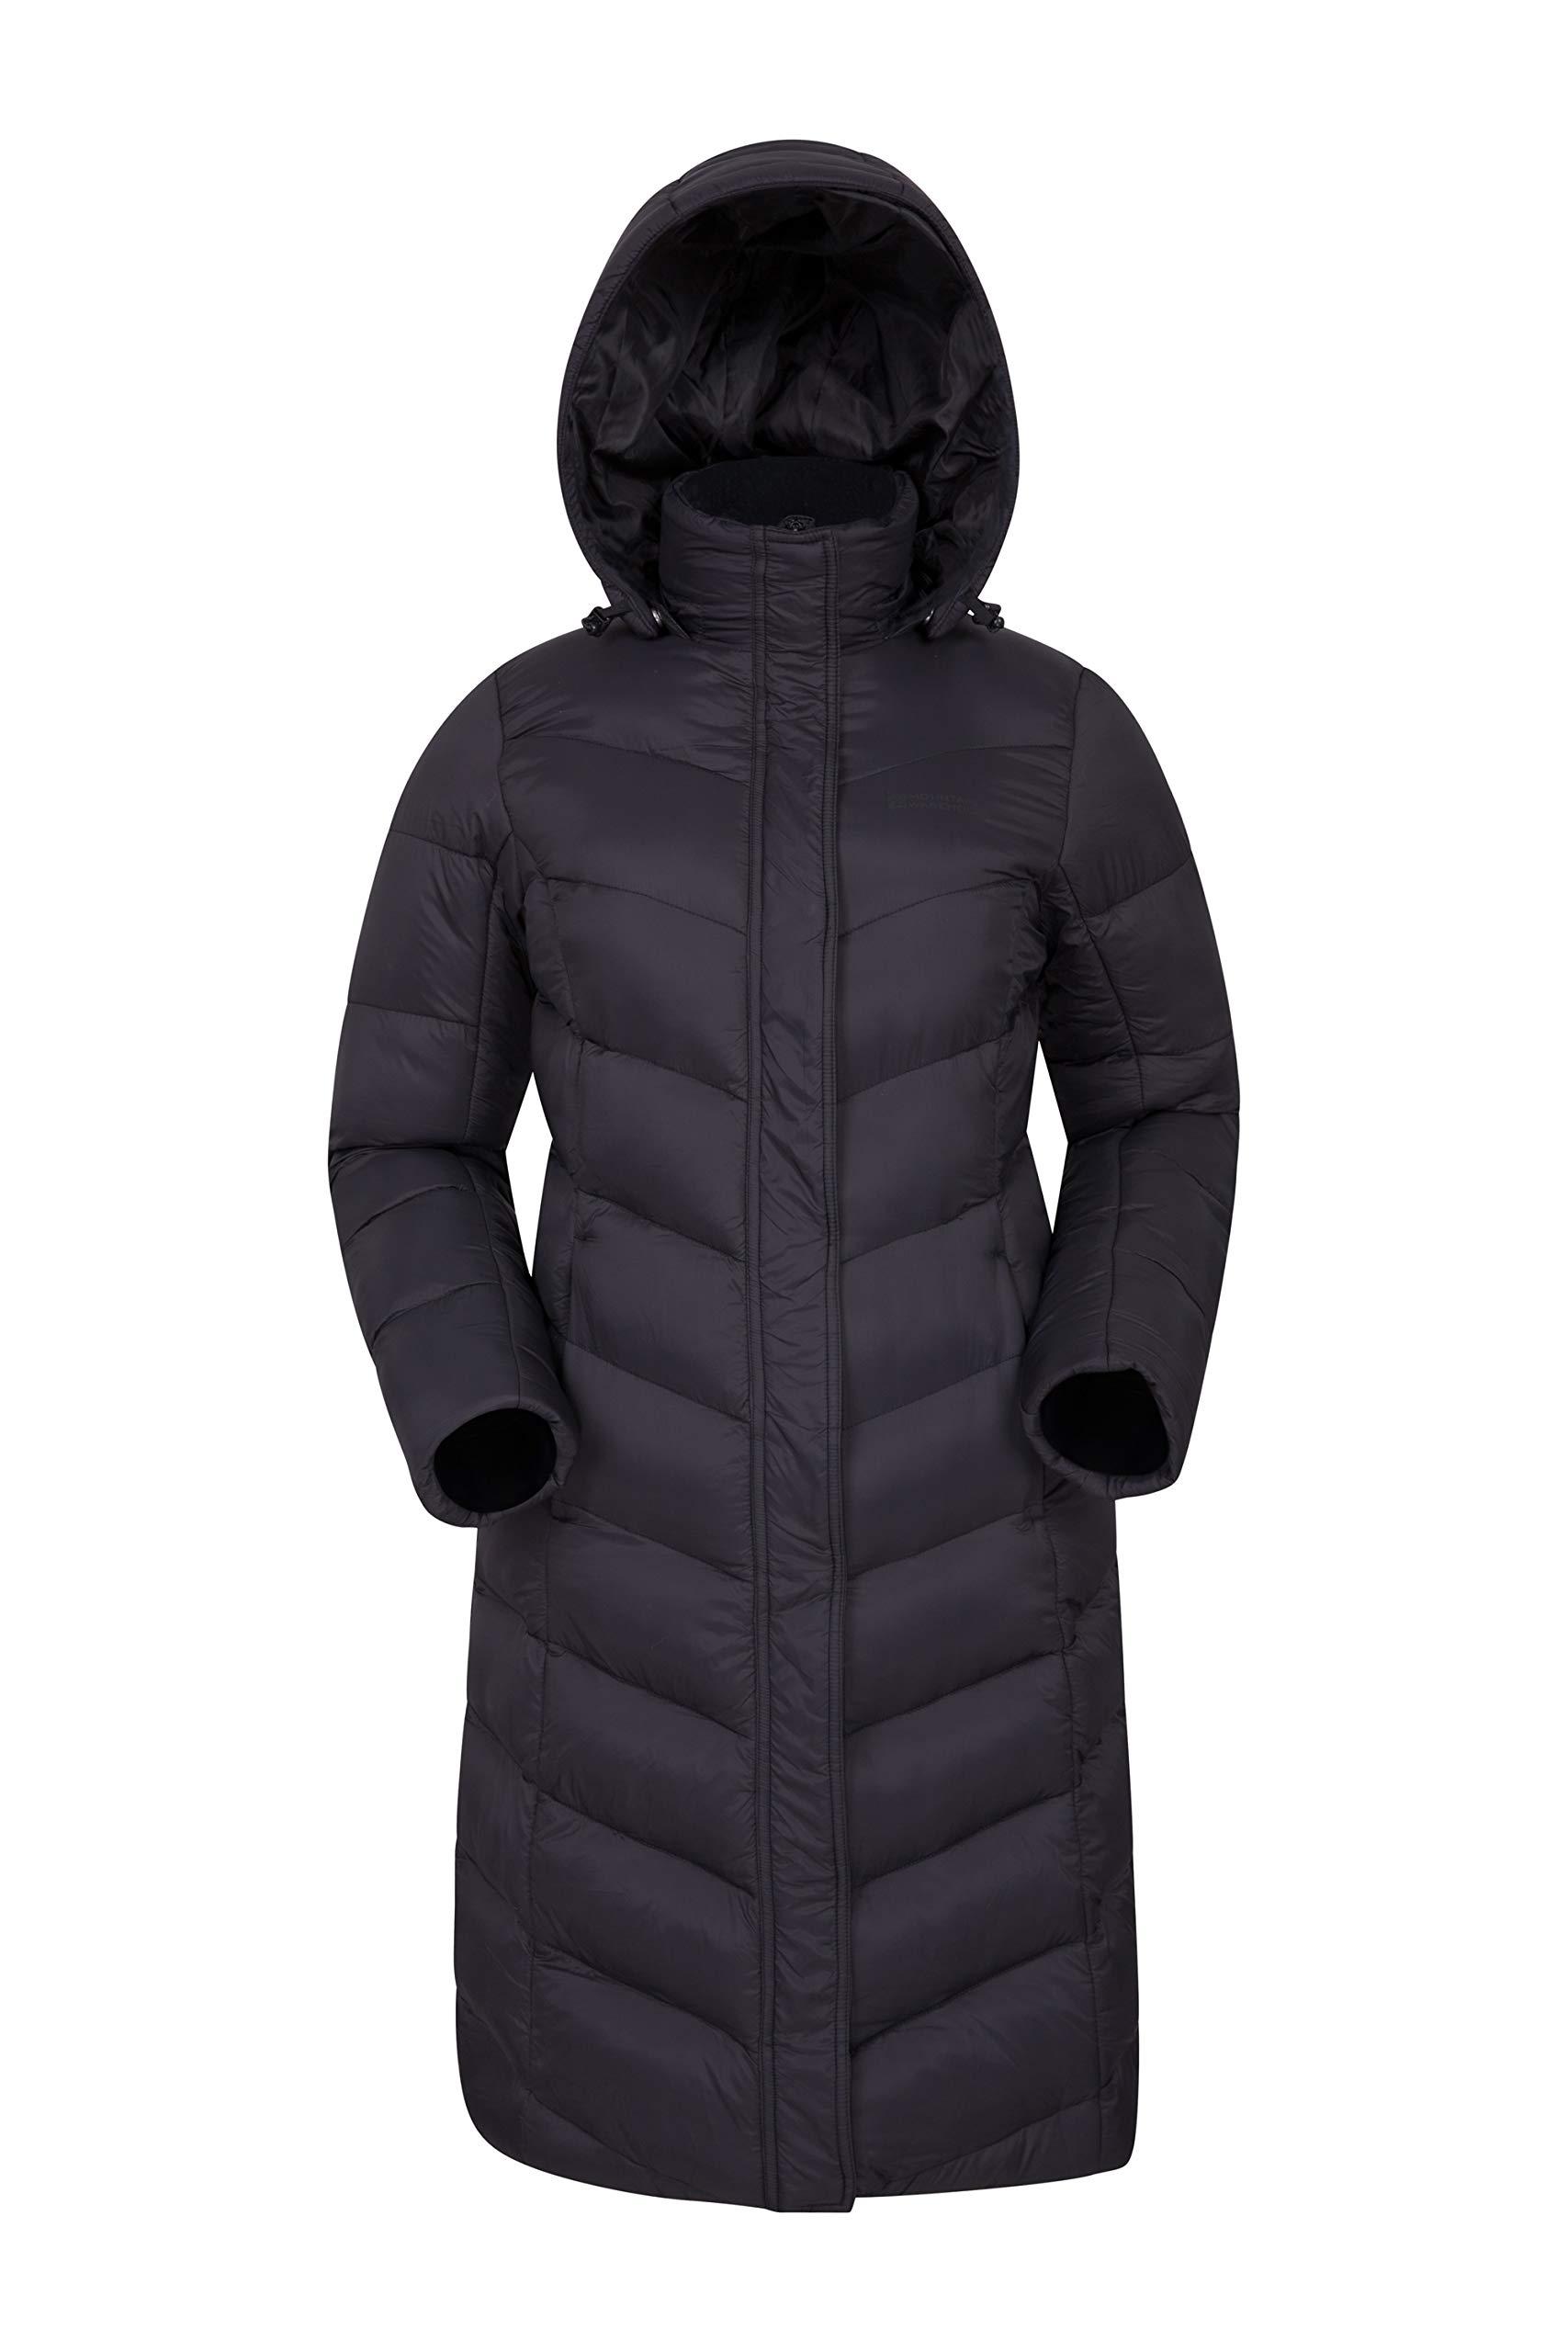 71iMofI80mL - Mountain Warehouse Alexa Womens Padded Jacket - Water Resistant, Lightweight, Storm Flap, Adjustable Hoodie, Pockets…